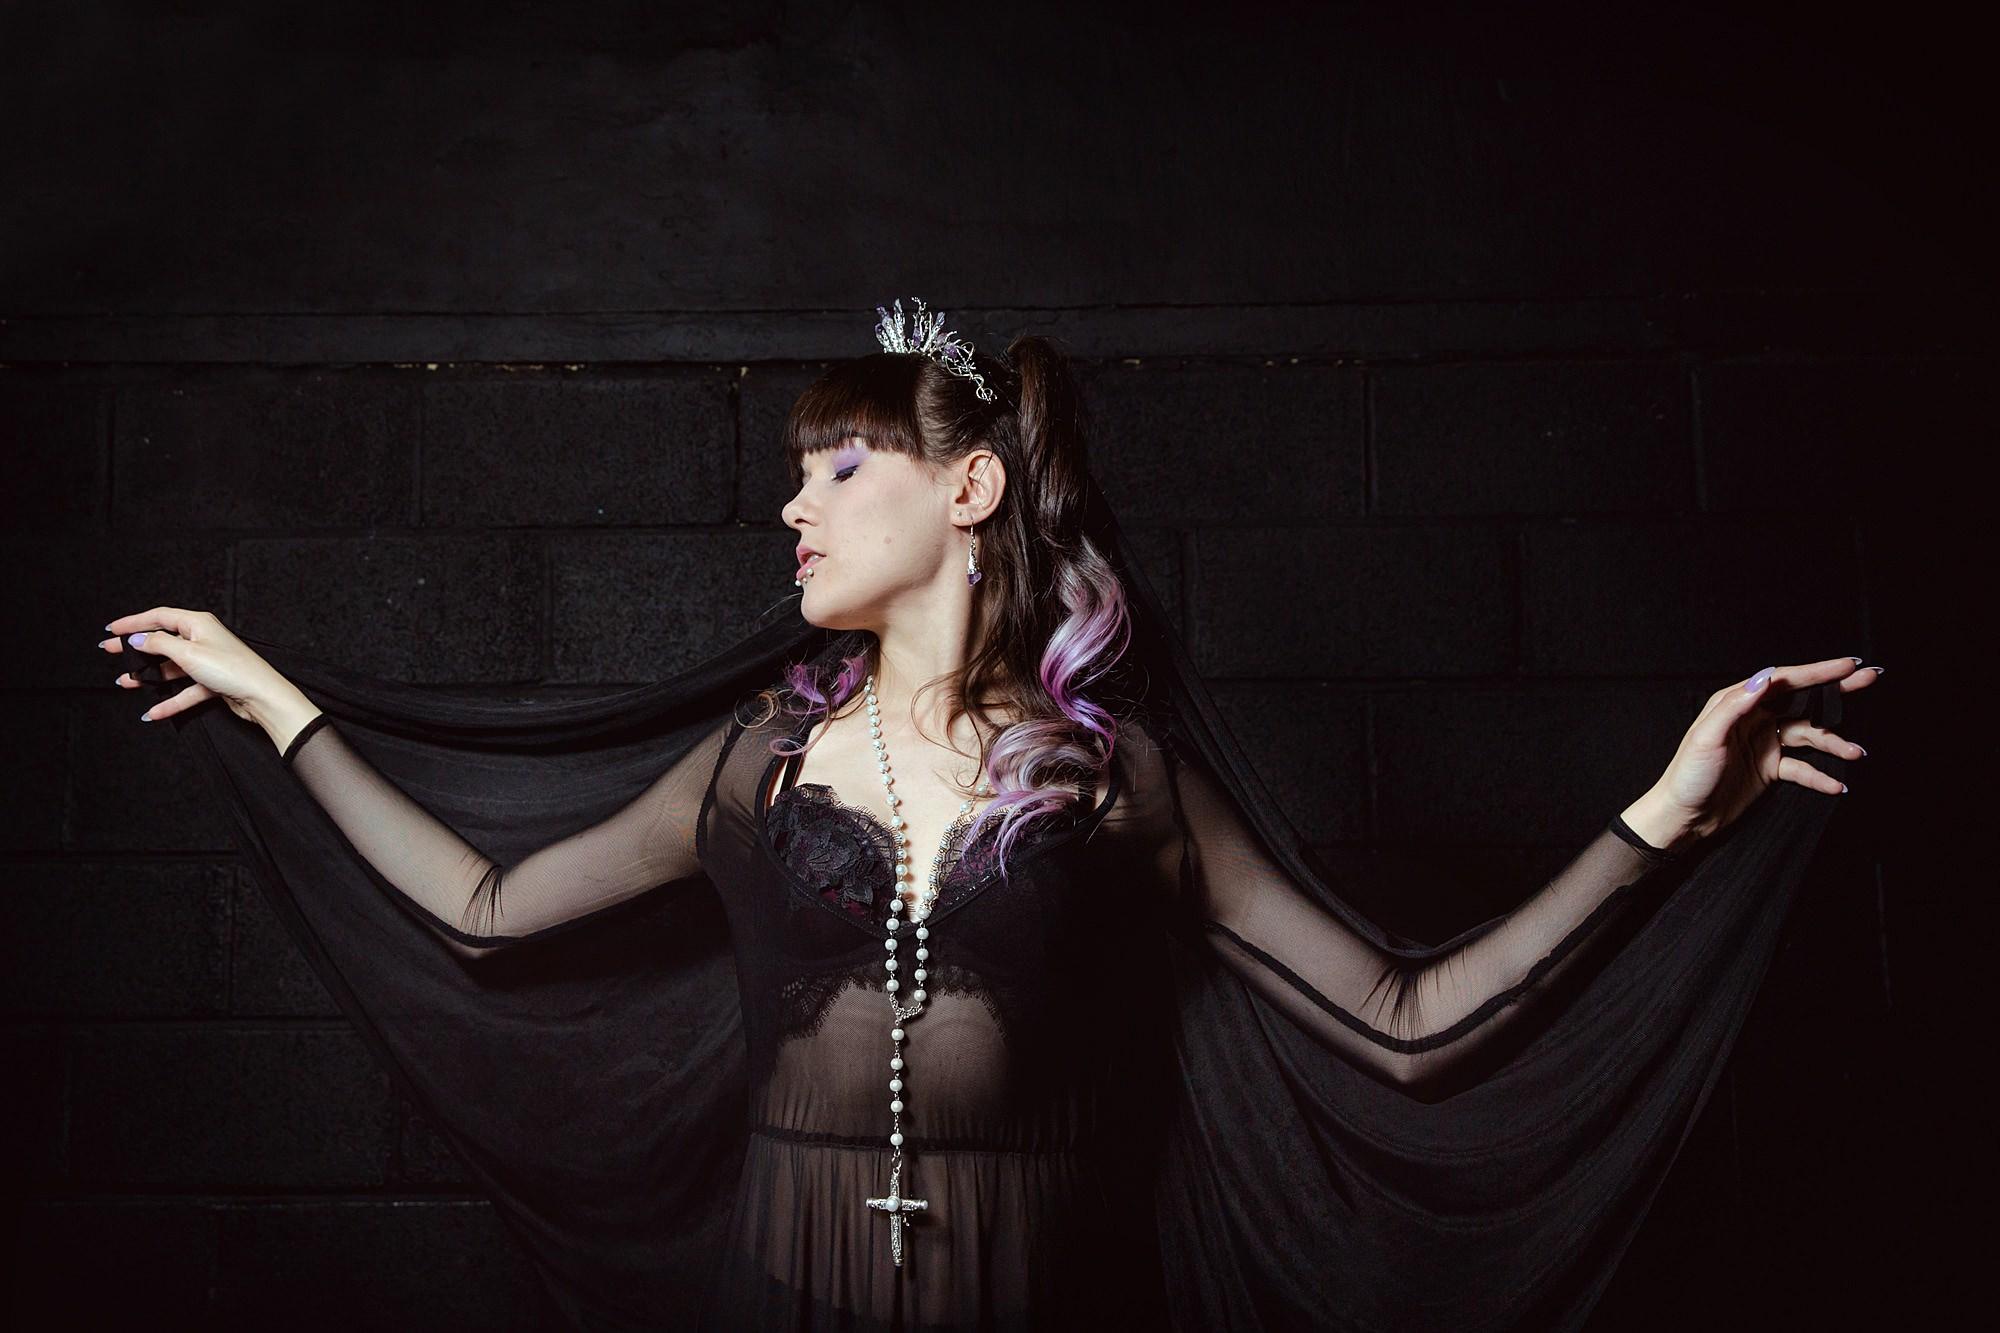 portrait of bride in amethyst crown and black dress at goth wedding